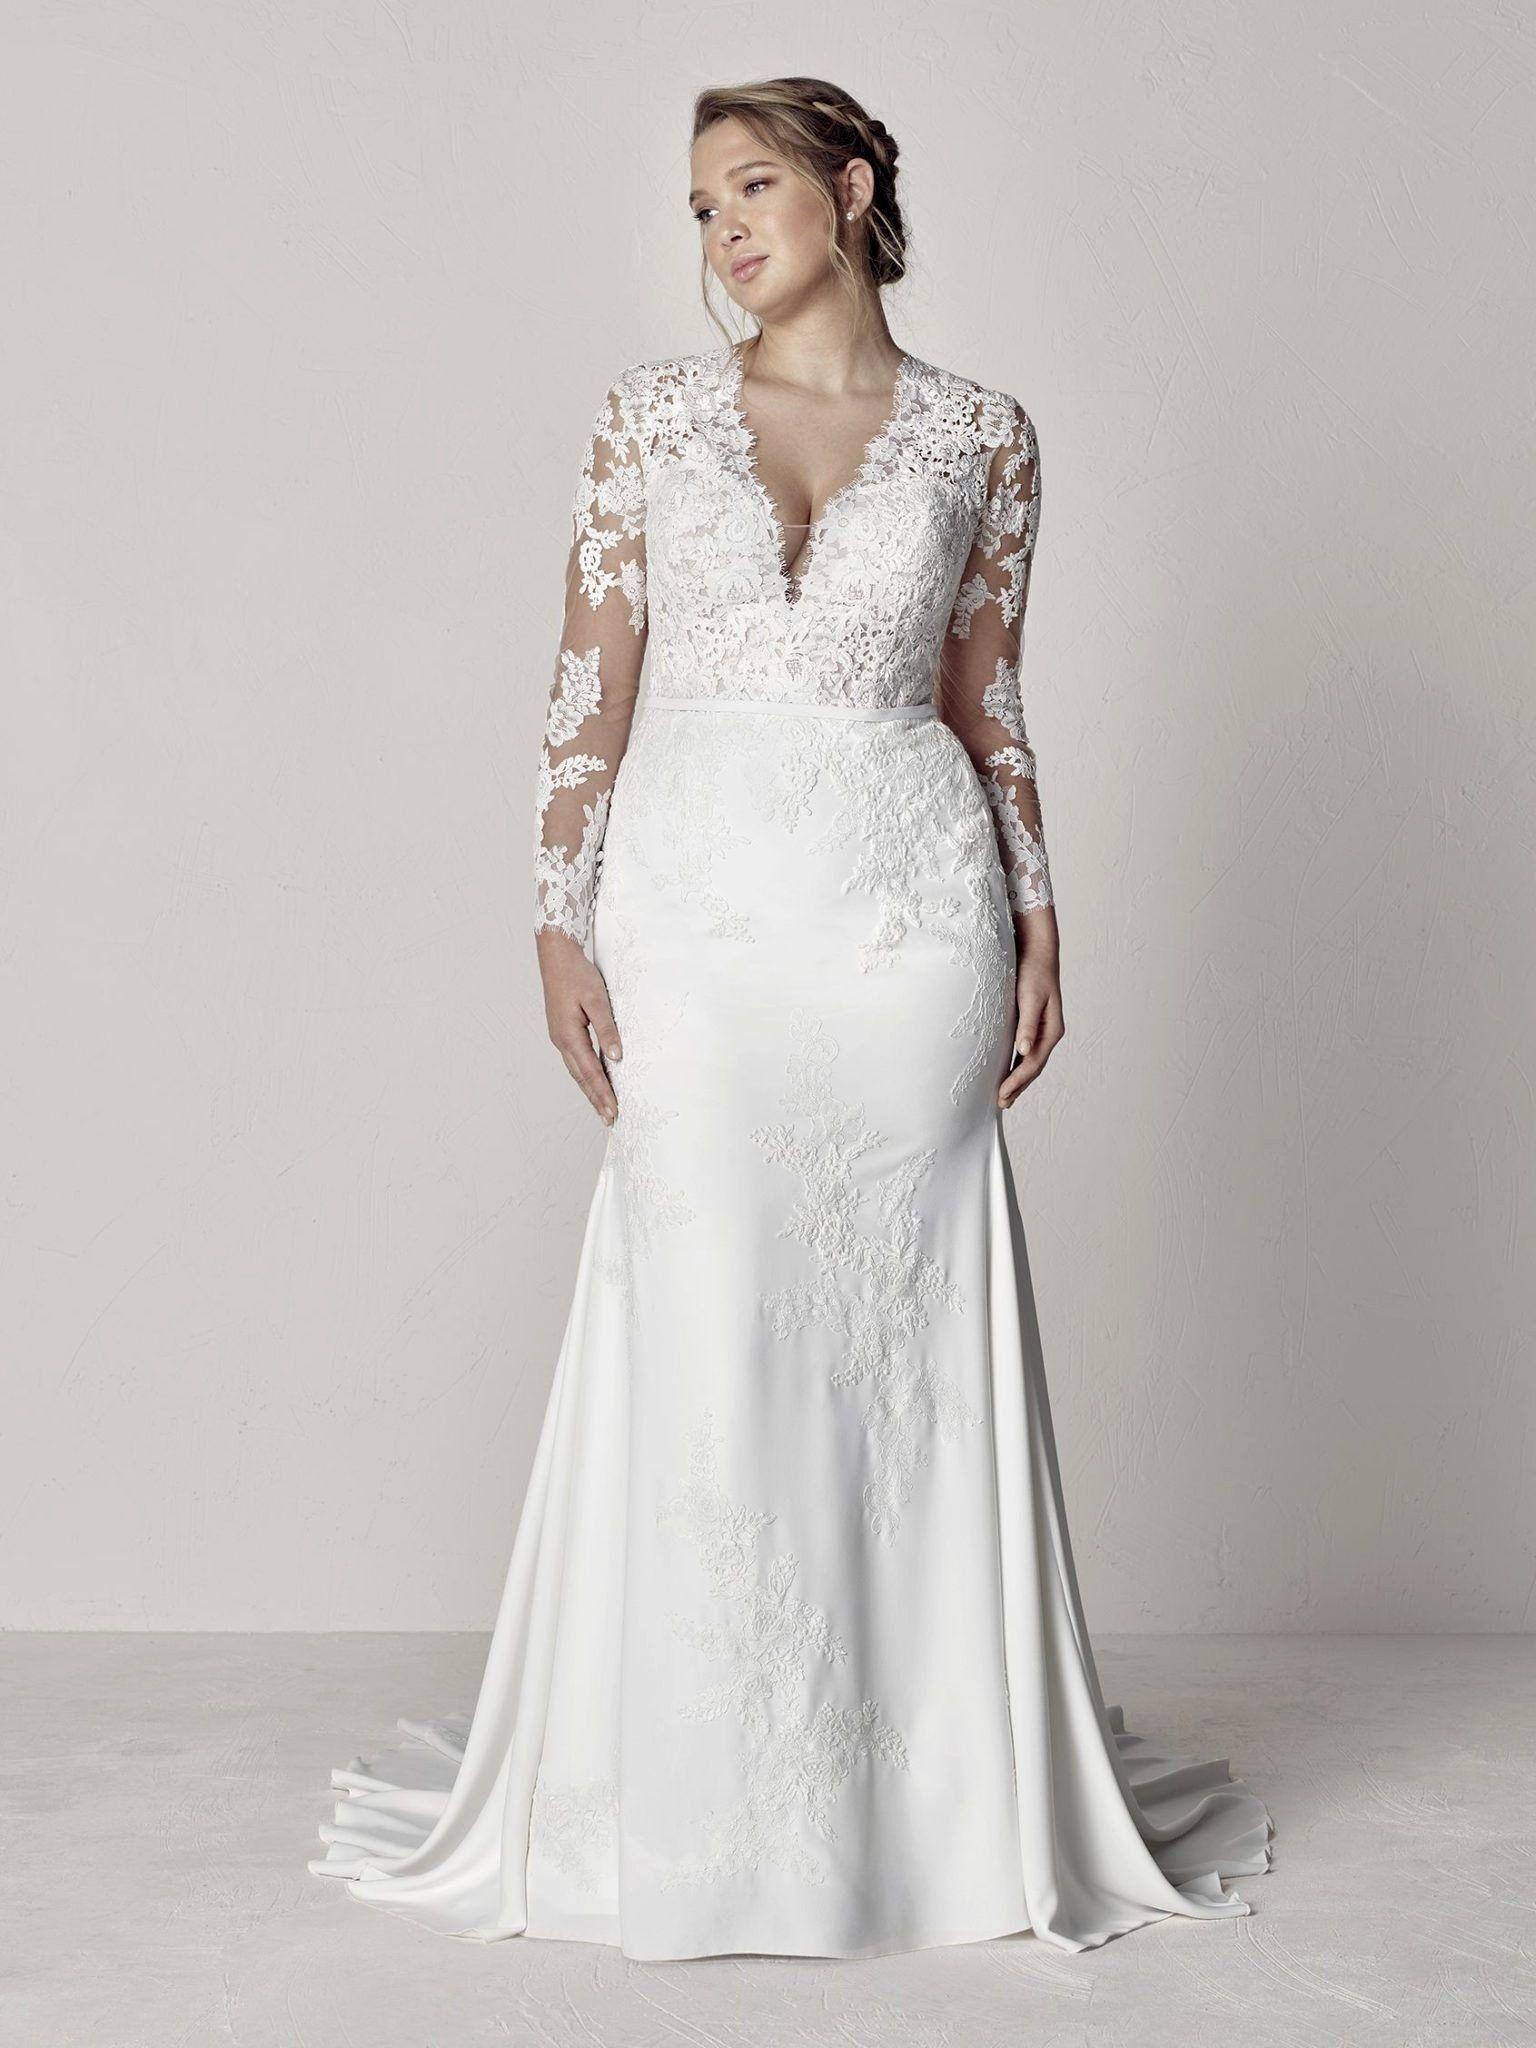 Kleinfeld Plus Size Wedding Dress Inspirational Plus Wedding Dress With Sleeves Vittnerp Plus Wedding Dresses Wedding Dress Long Sleeve Plus Size Wedding Gowns